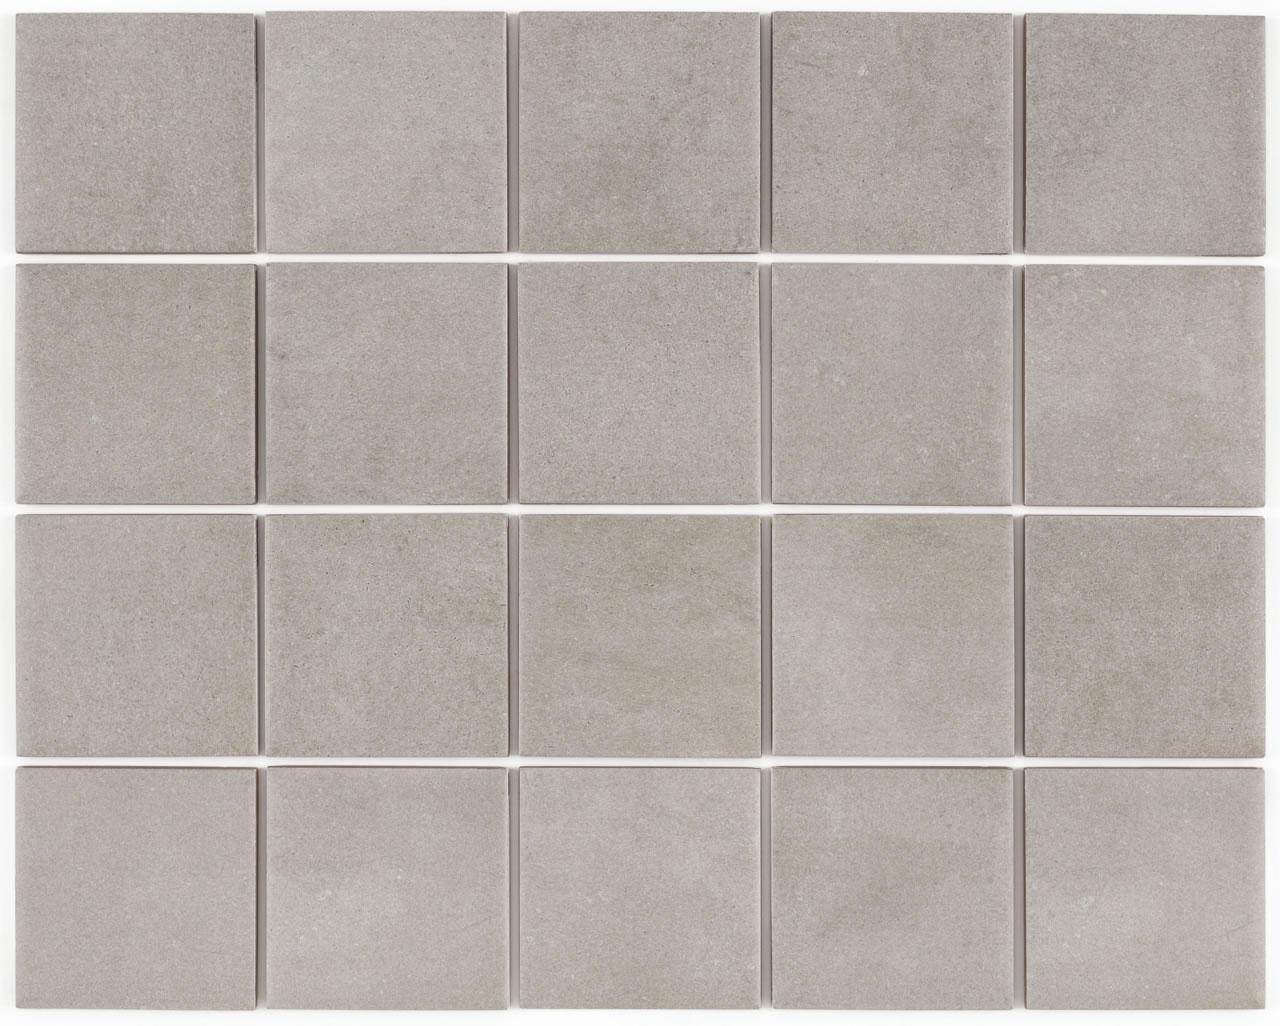 munari cimento mesh br 7,5×7,5